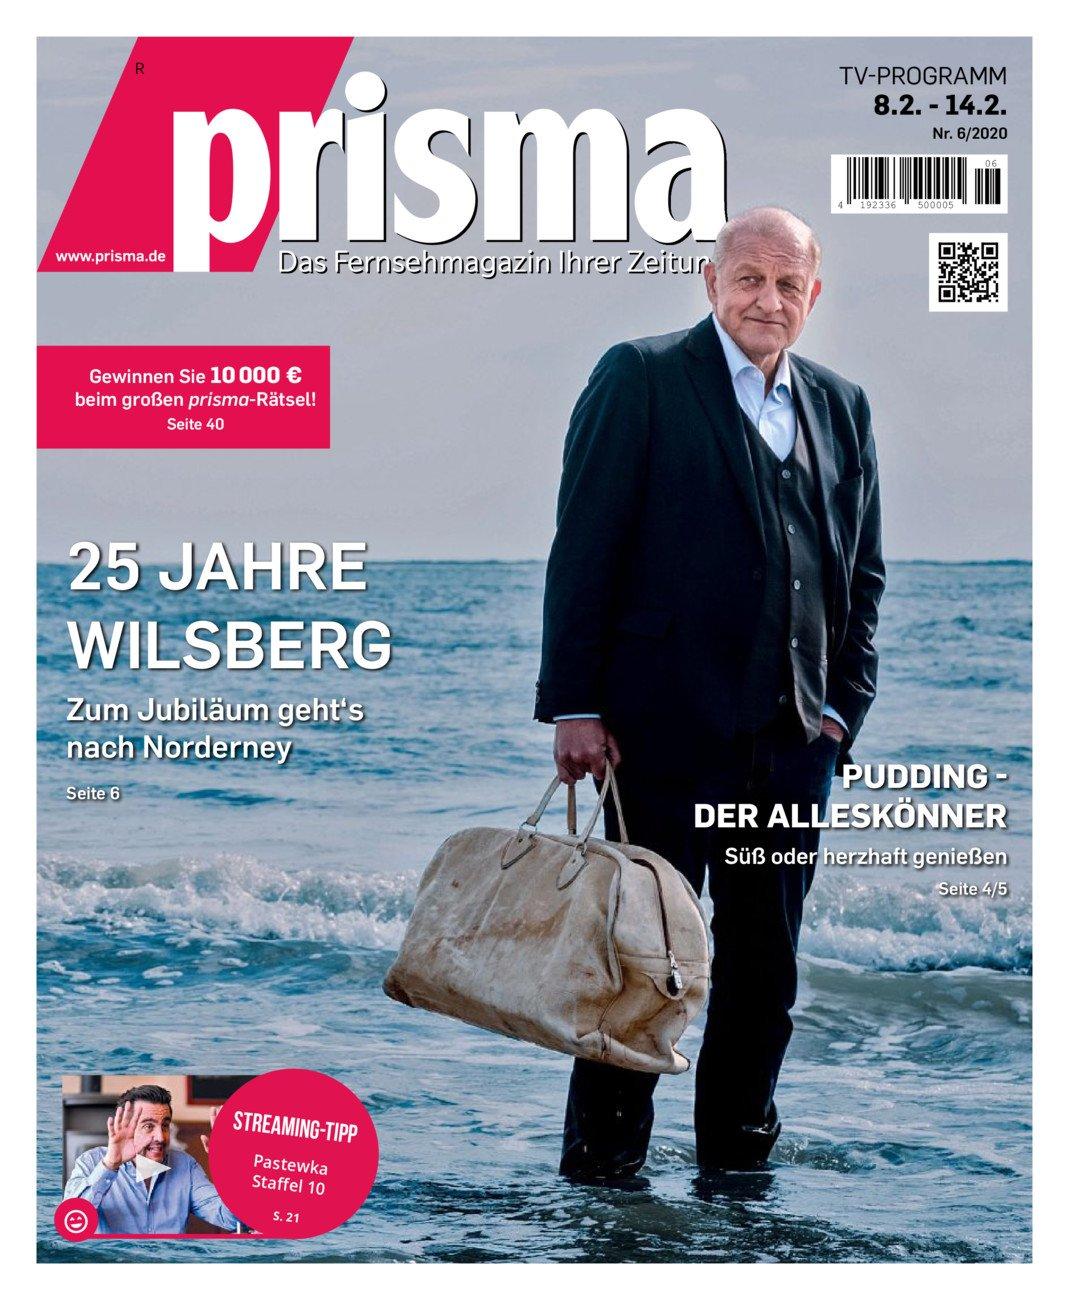 Prisma 8. - 14.2